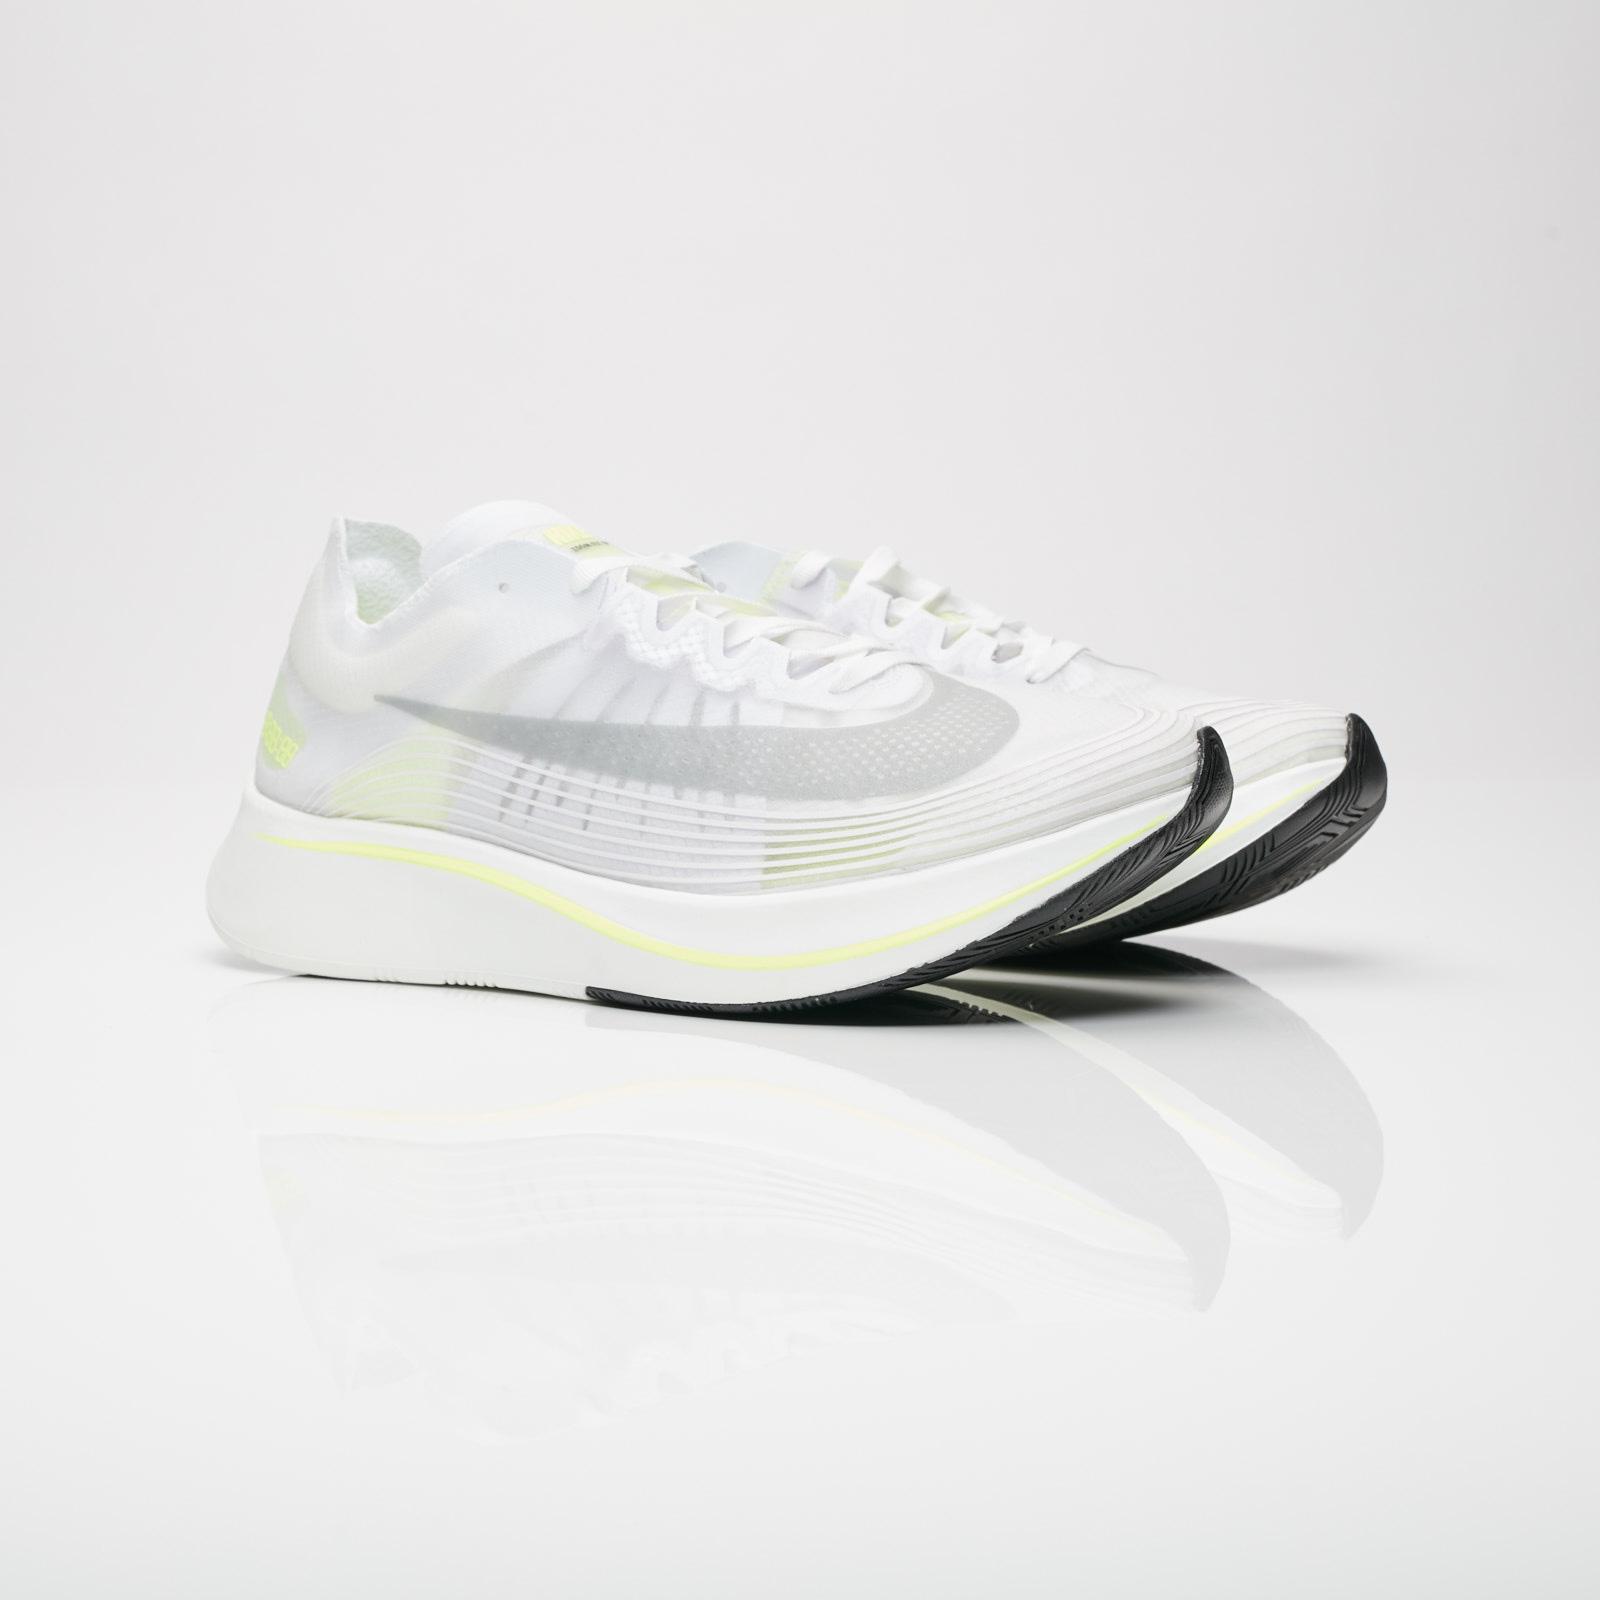 44b08f13f2ac Nike Zoom Fly SP - Aj9282-107 - Sneakersnstuff